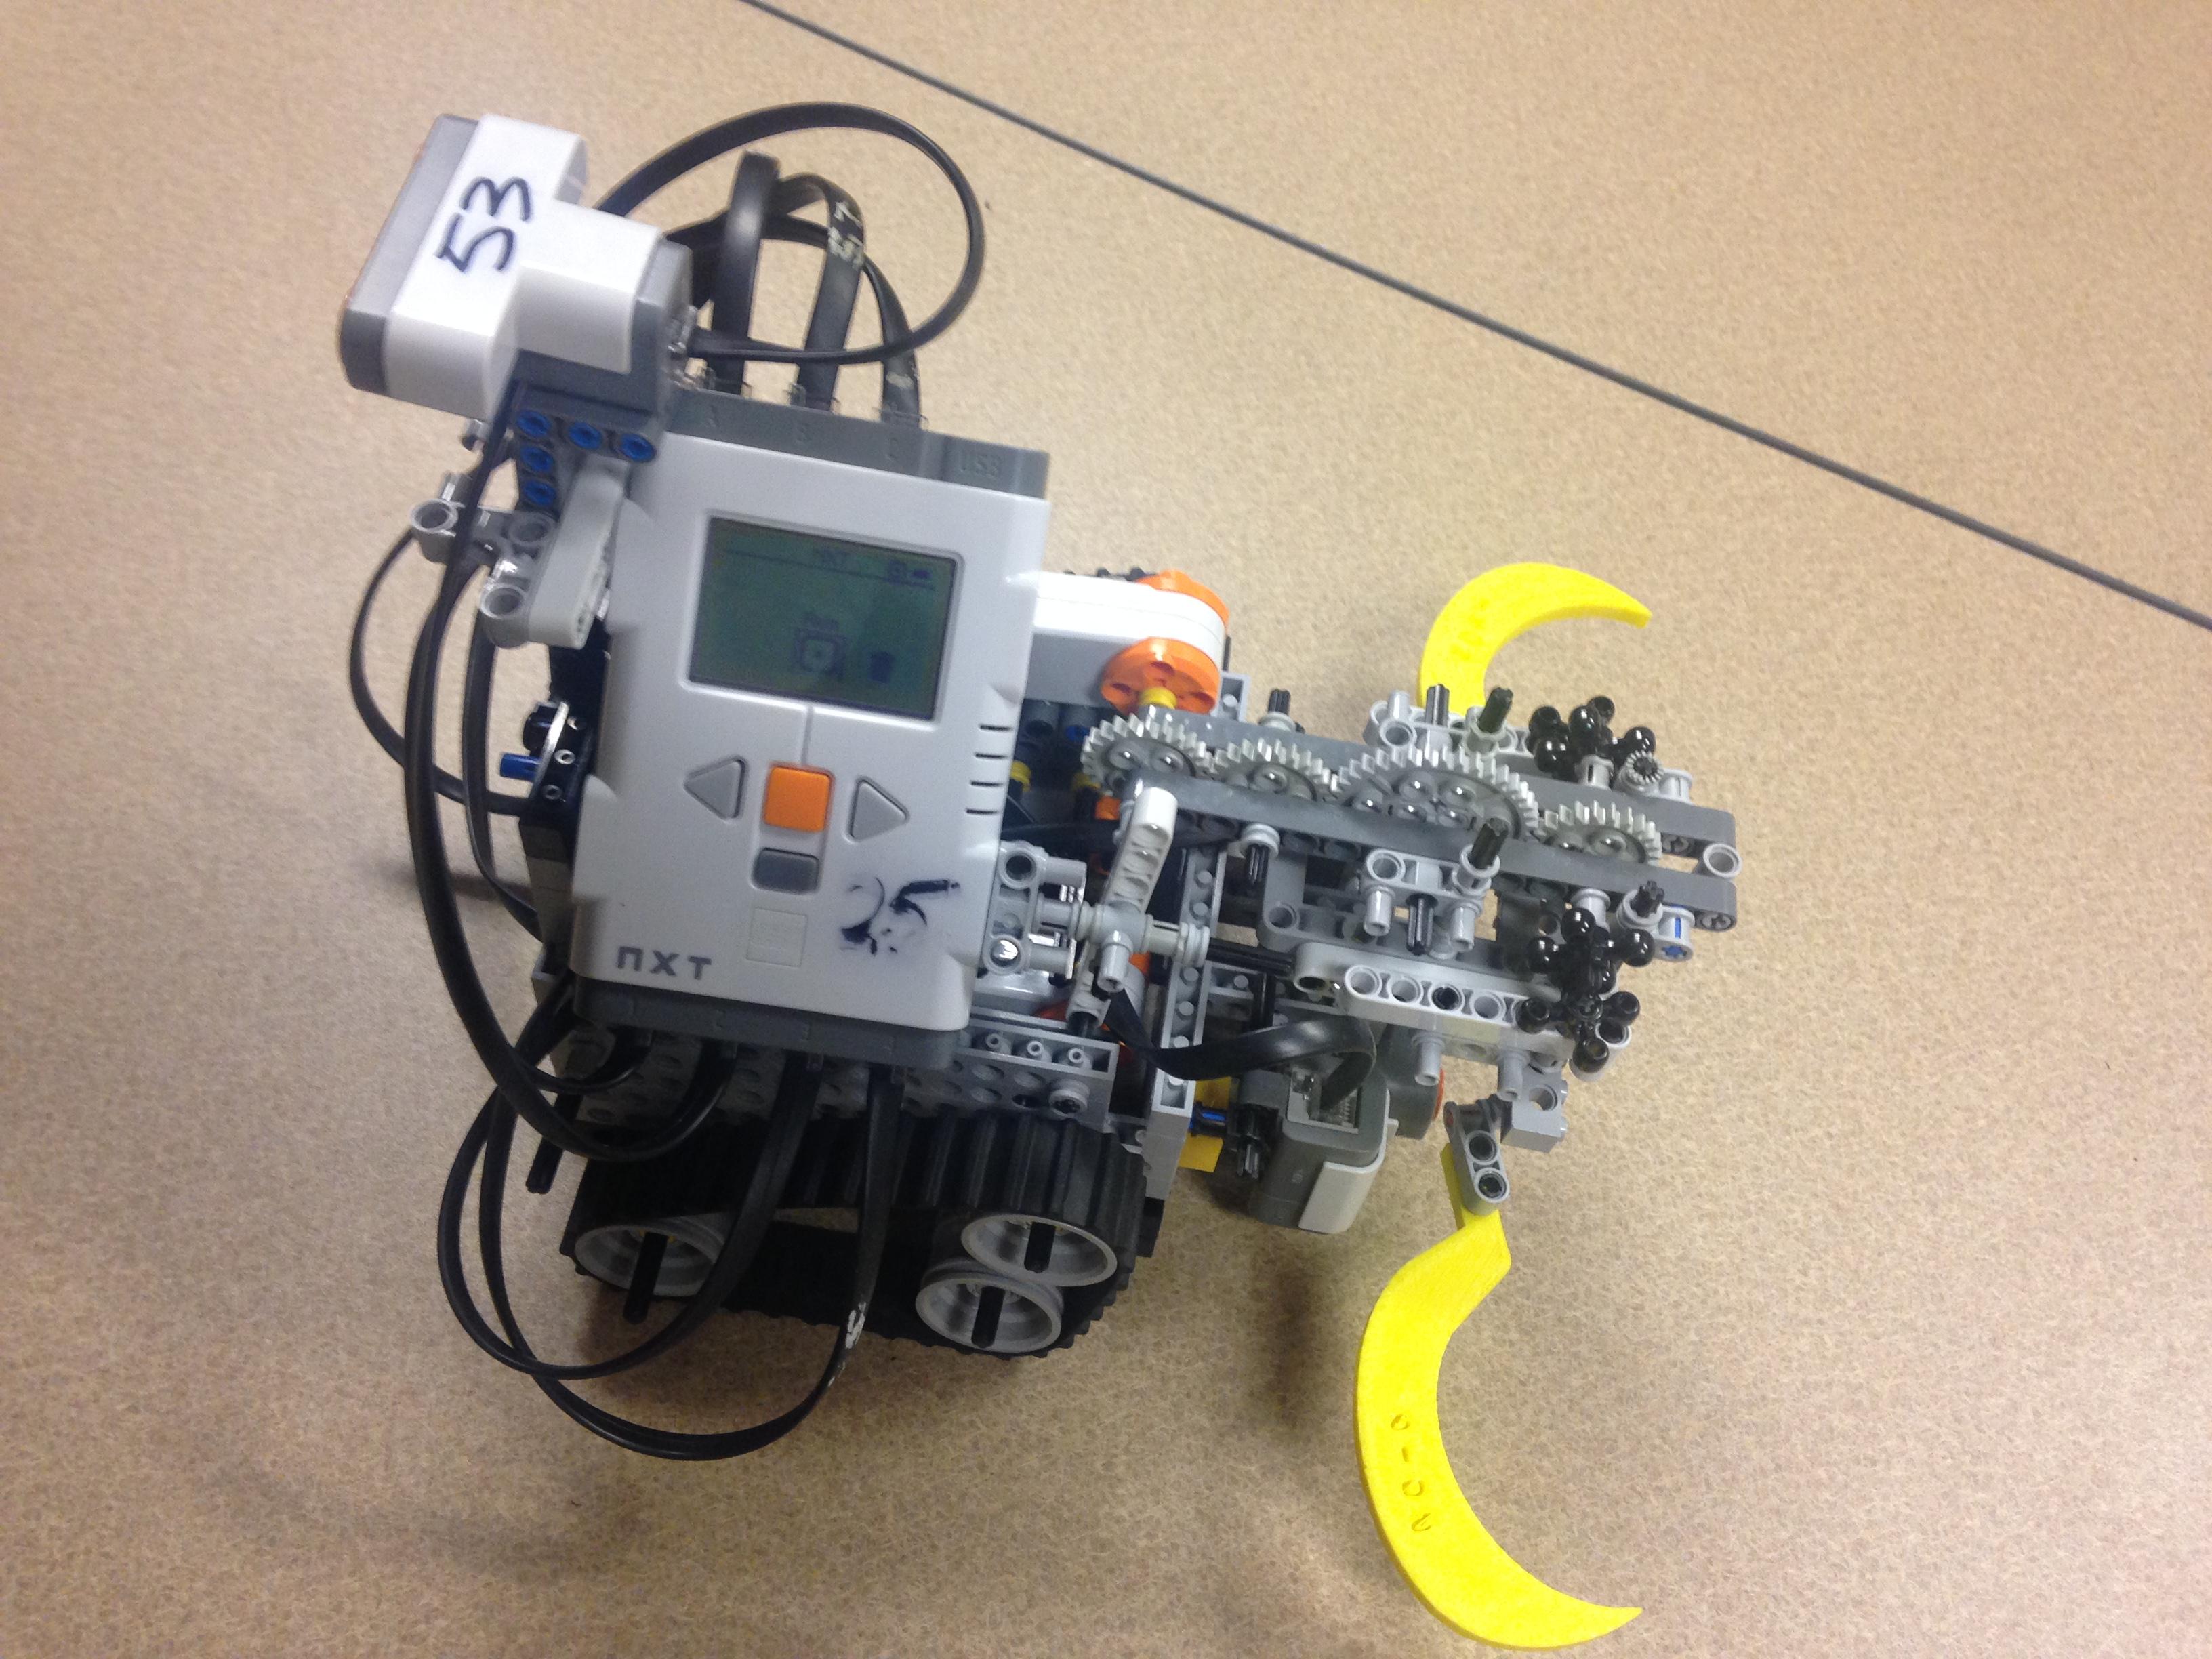 GitHub - DevanshV/LEGO-Grab-and-Retrieve-Robot: C-Based